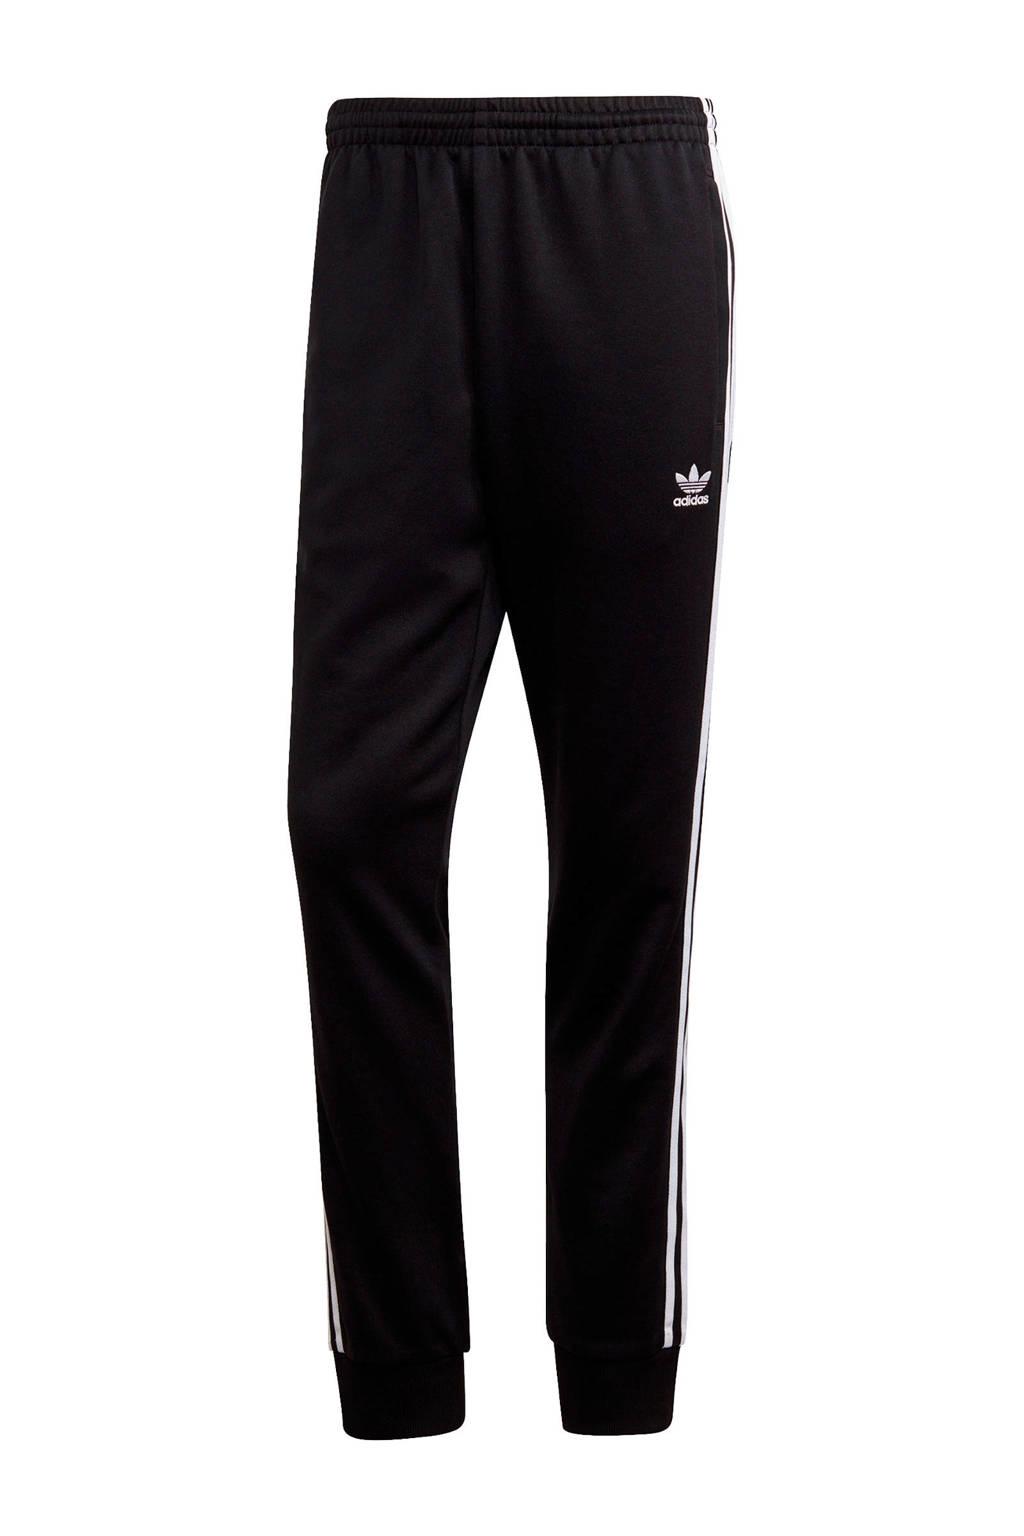 adidas Originals trainingsbroek zwart, Zwart